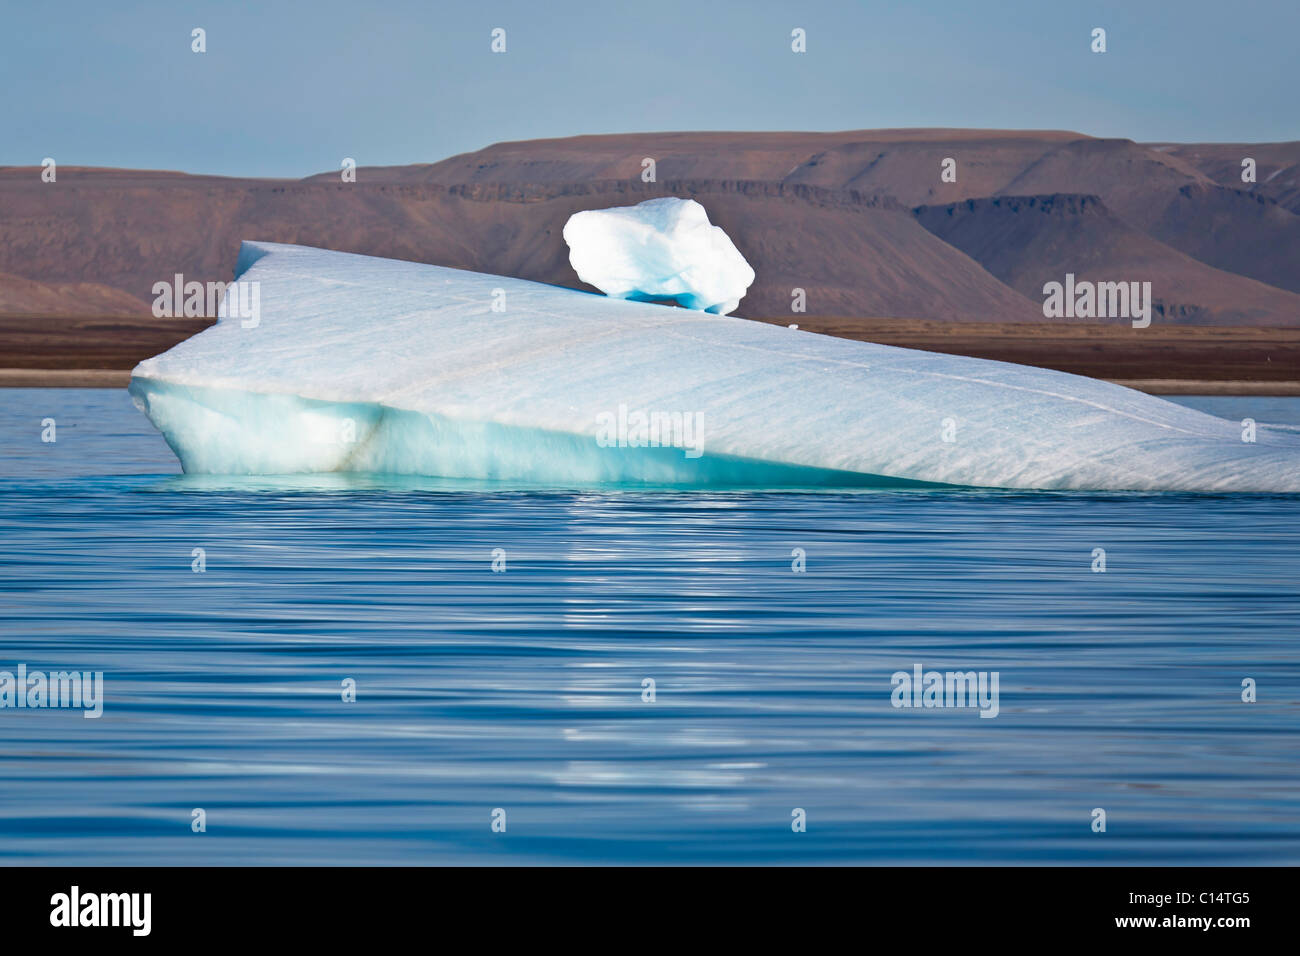 Iceberg, Croker Bay, Devon Island, Qikiqtaaluk Region, Nunavut, Canada. - Stock Image